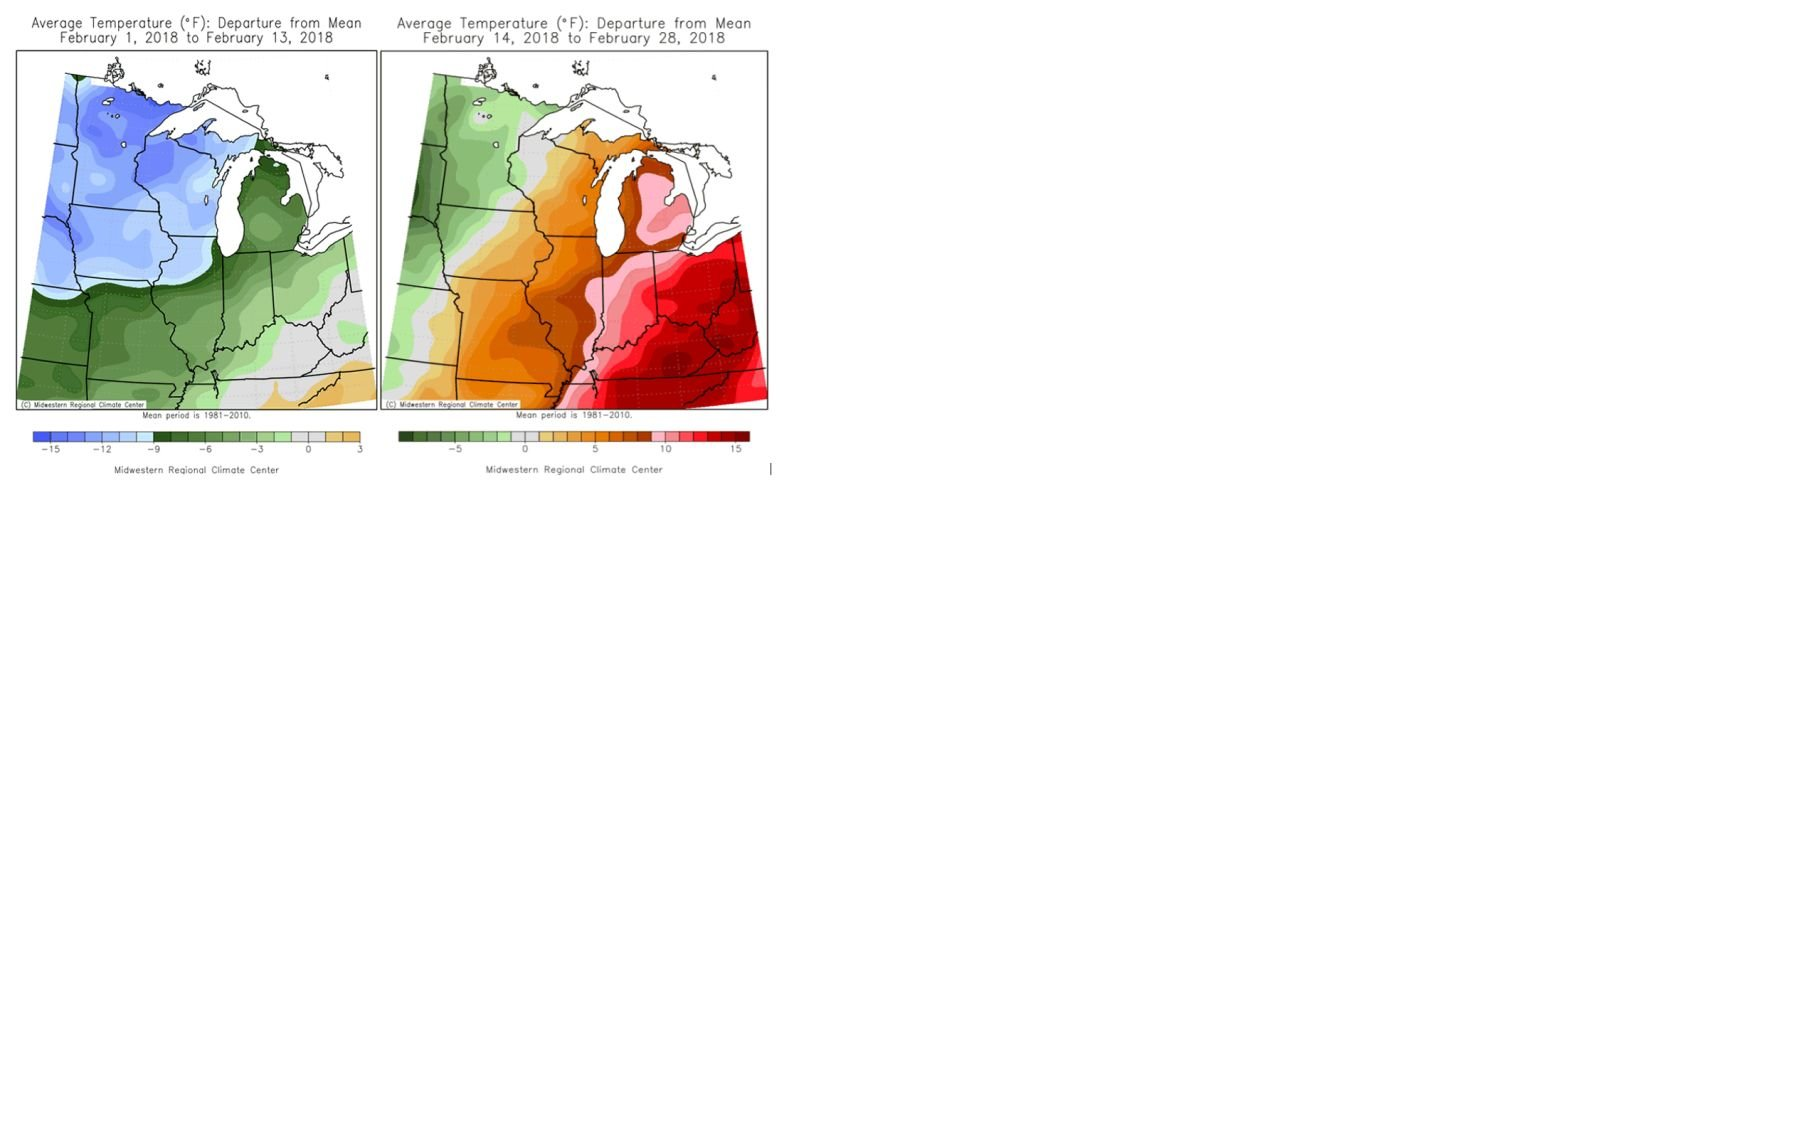 February temperatures vs normal